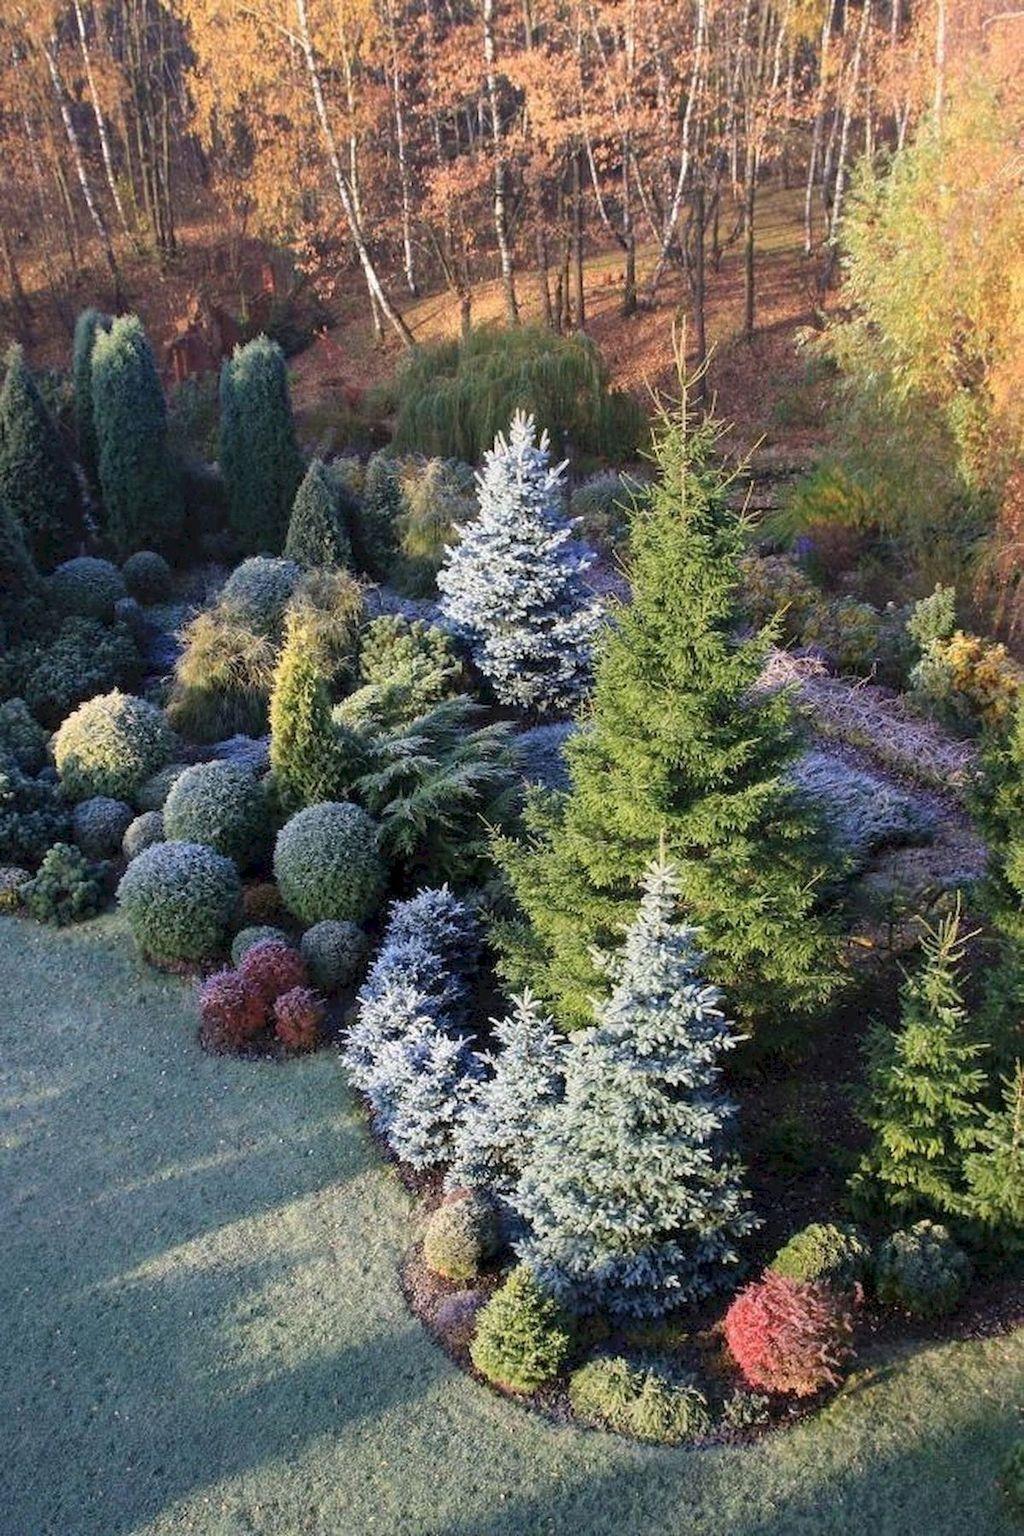 40 Outstanding Frontyard Garden Design Ideas You Must Have Privacylandscaping In 2020 Japanese Garden Backyard Japanese Garden Design Small Japanese Garden